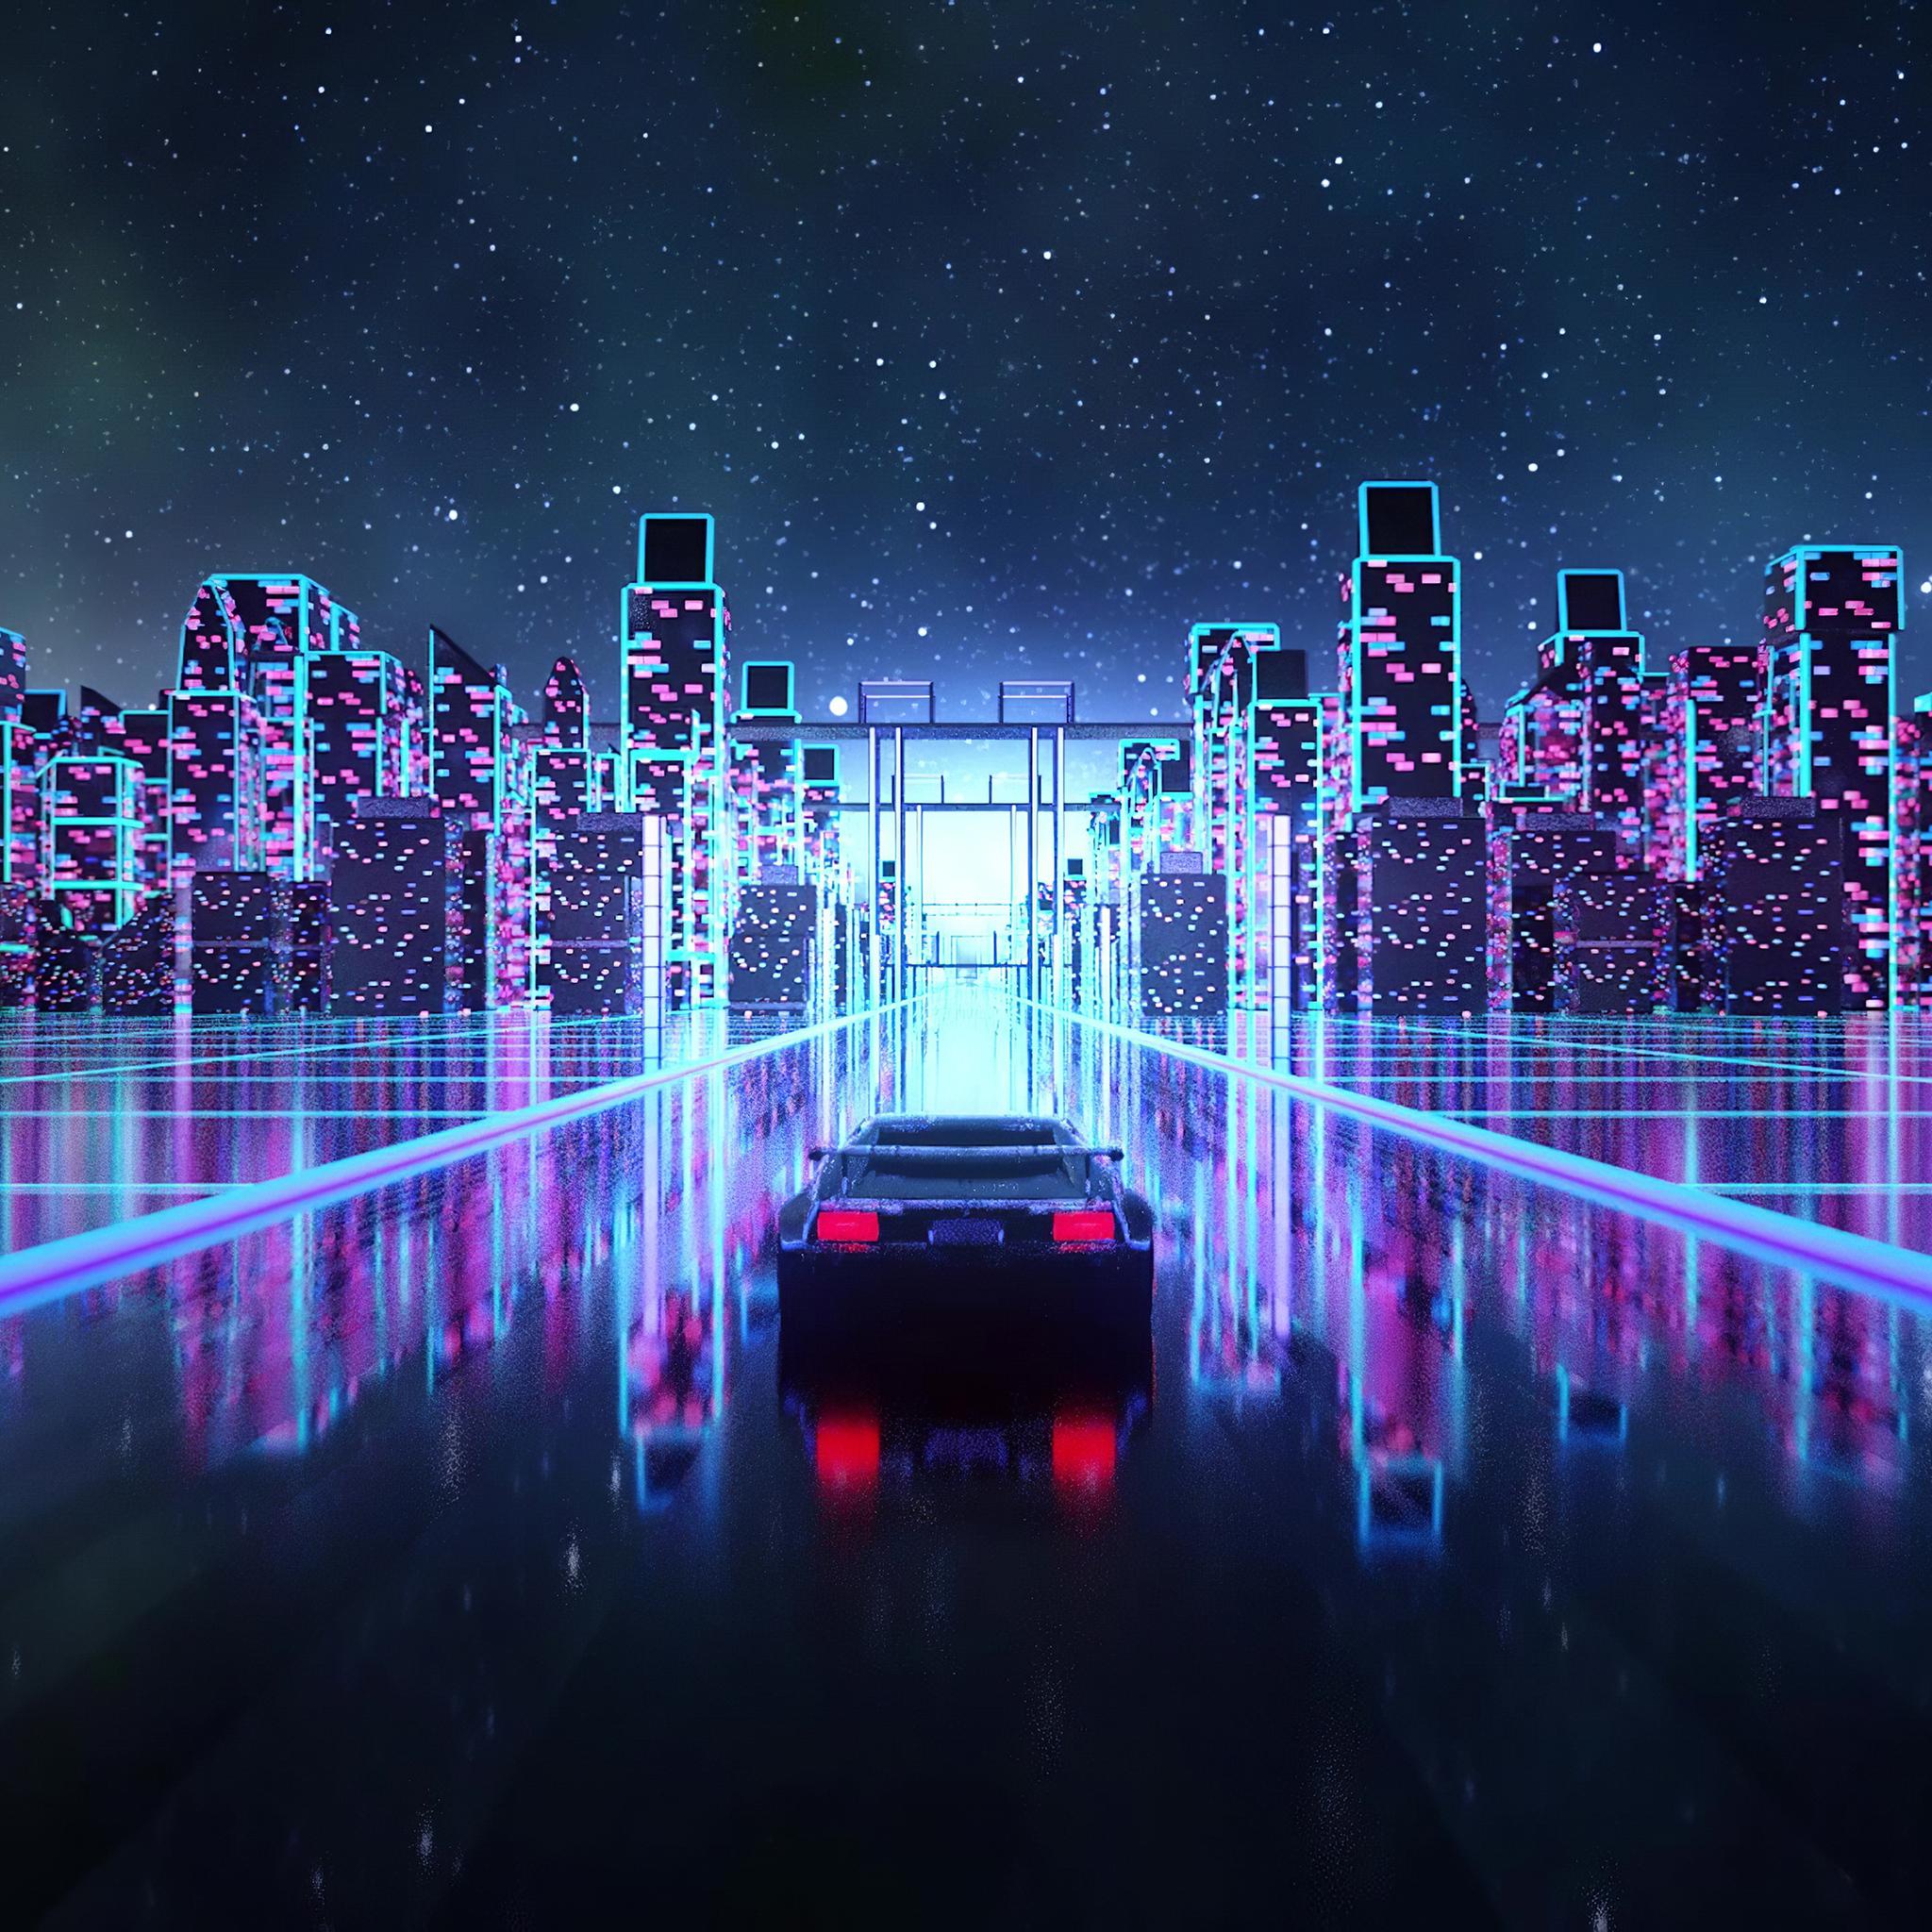 2048x2048 Cyber Outrun Vaporwave Synth Retro Car 4k Ipad ...